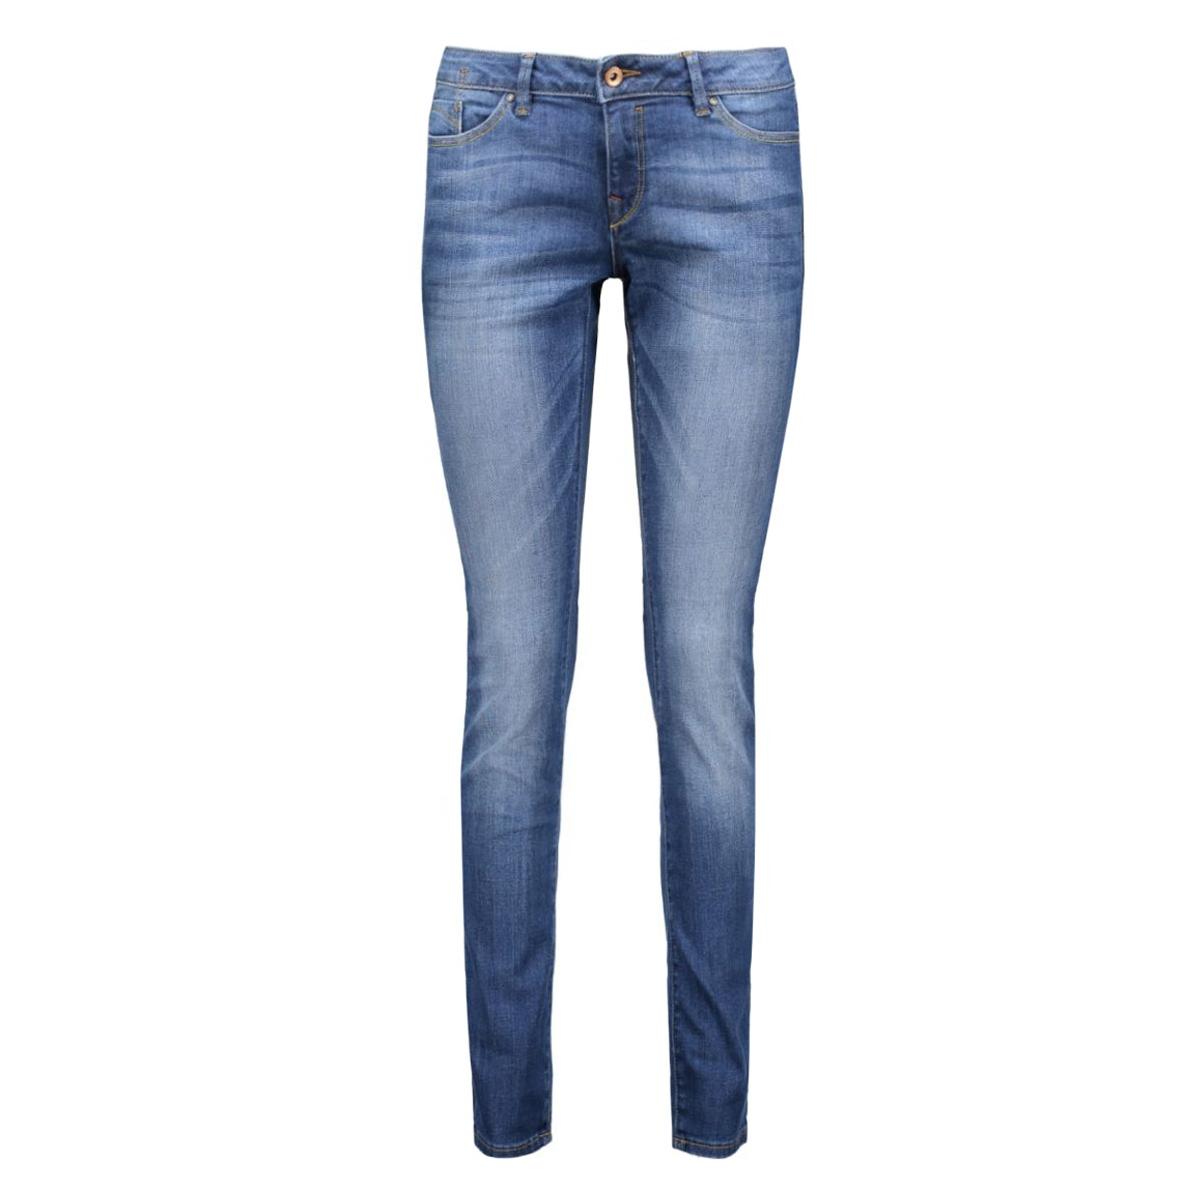 996cc1b910 edc jeans c902